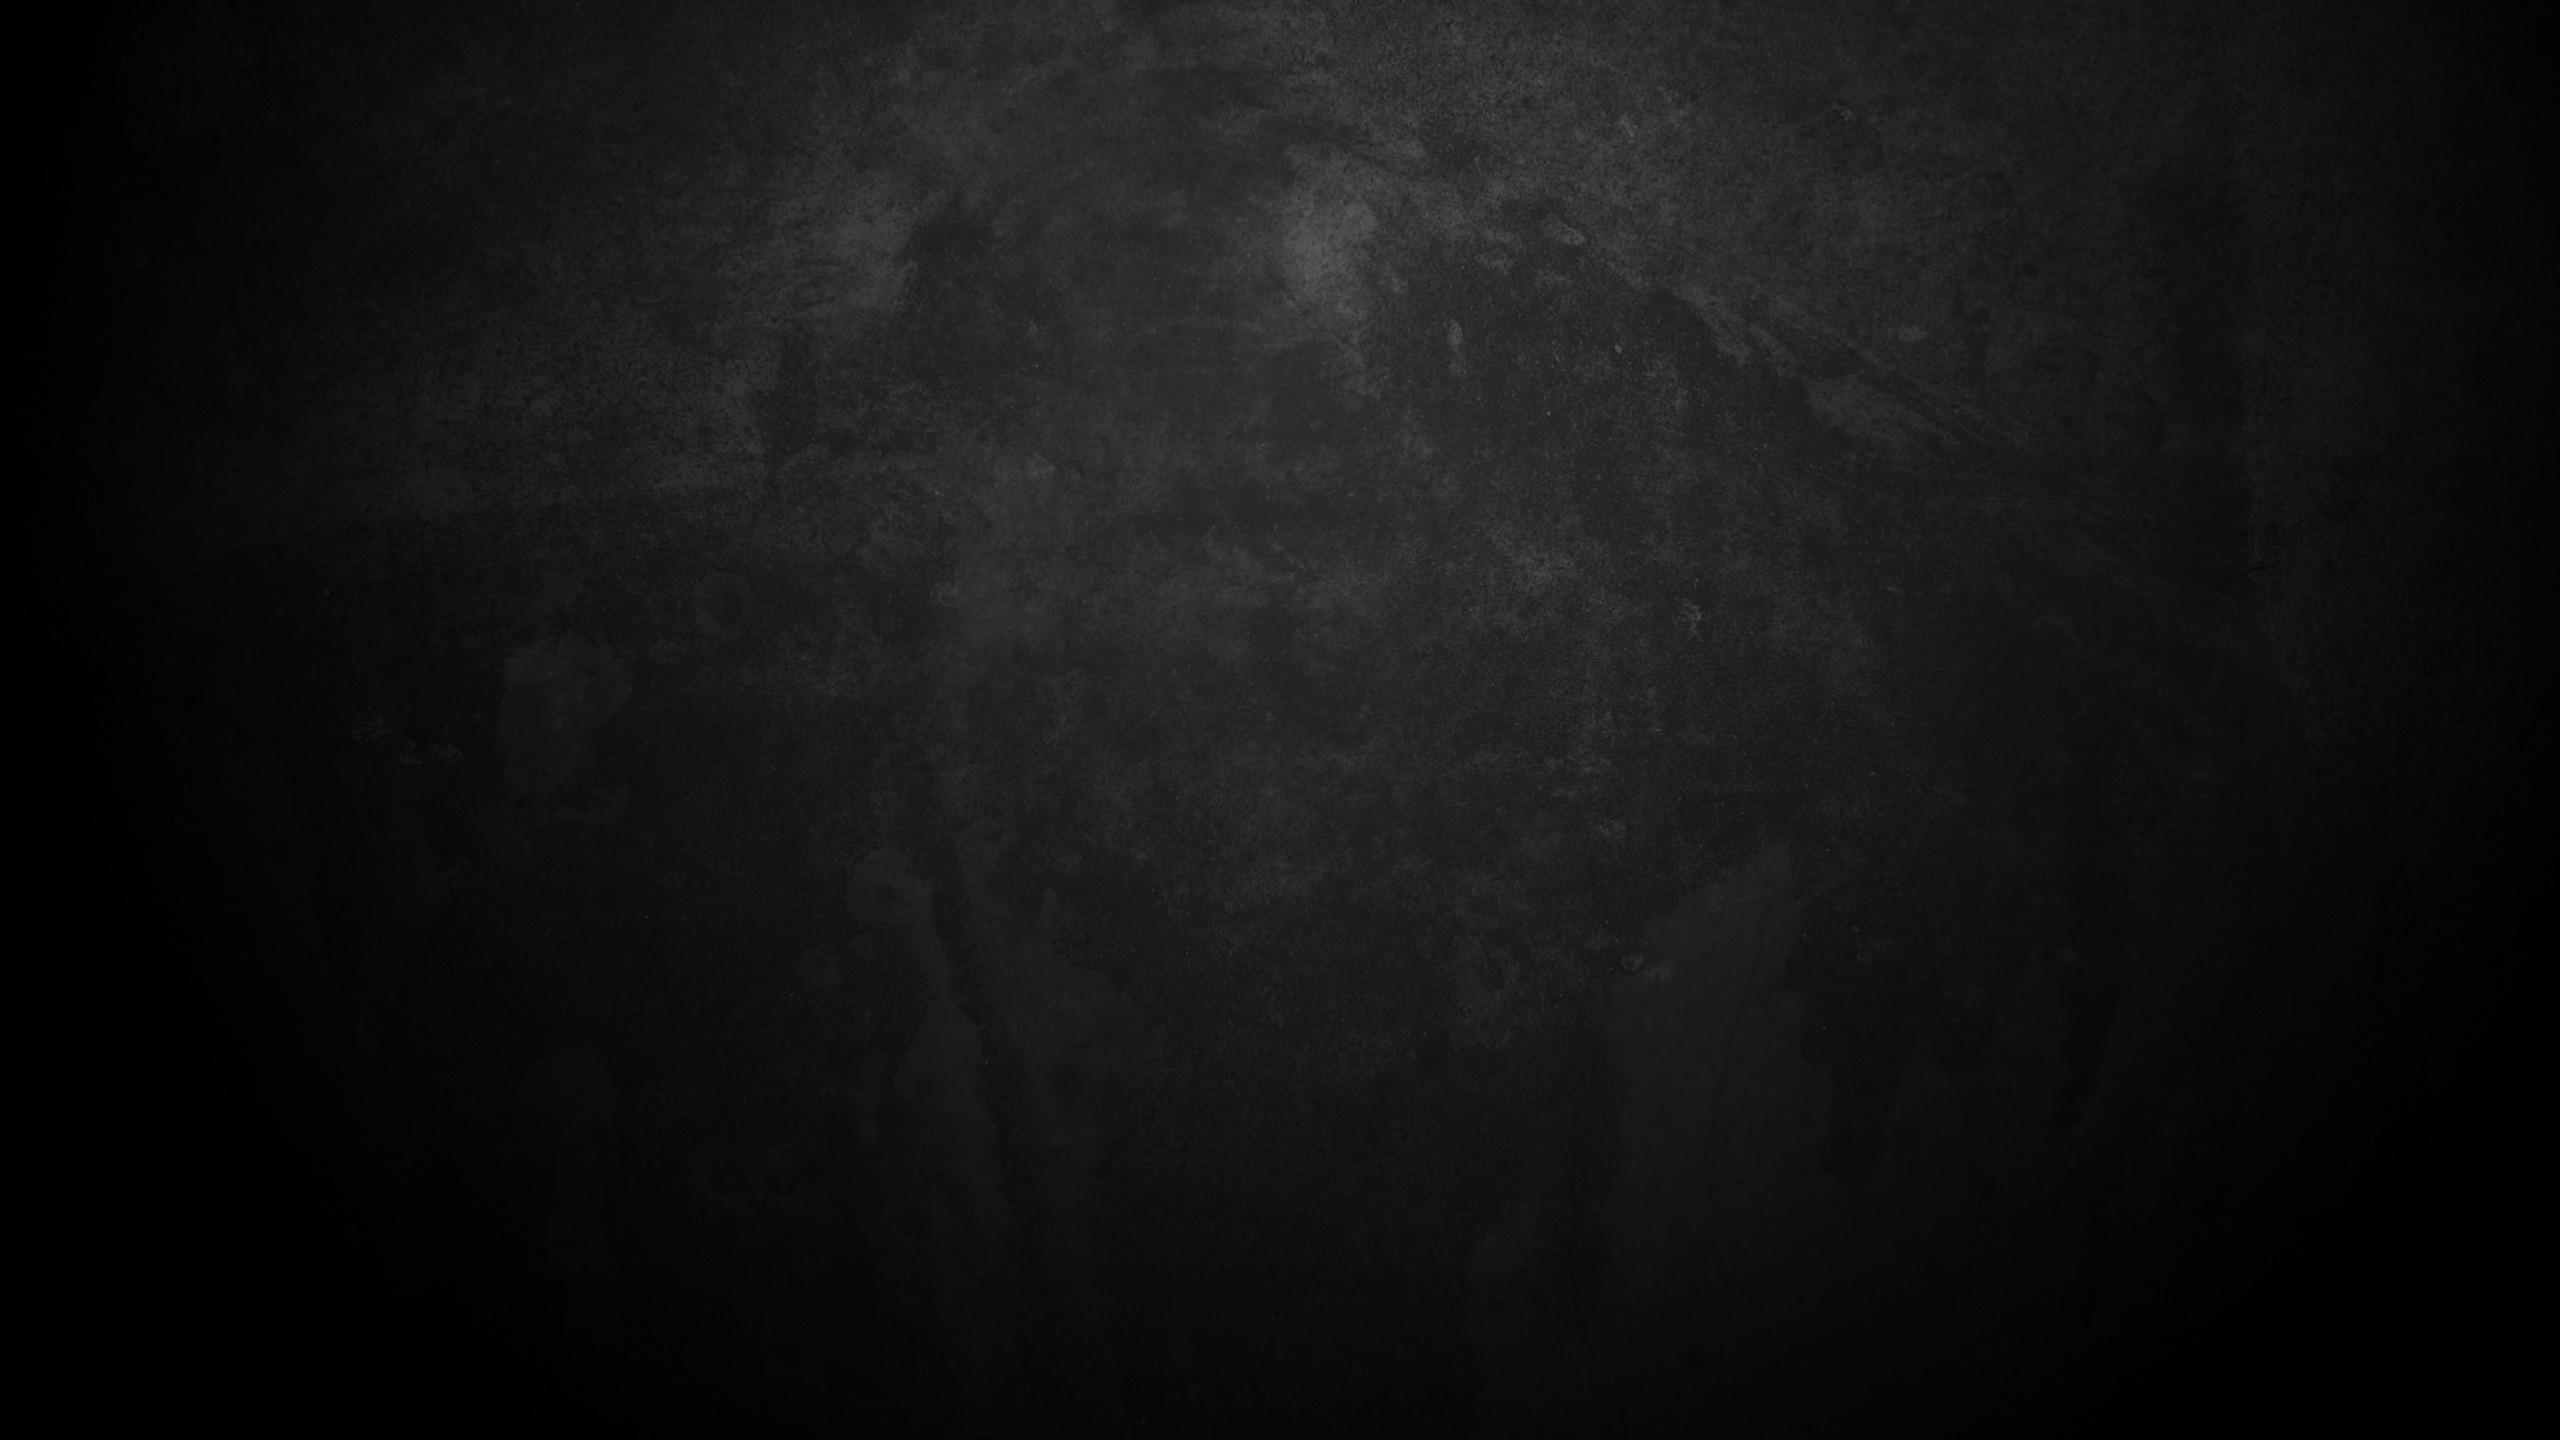 Wallpaper dark, spots, texture, background